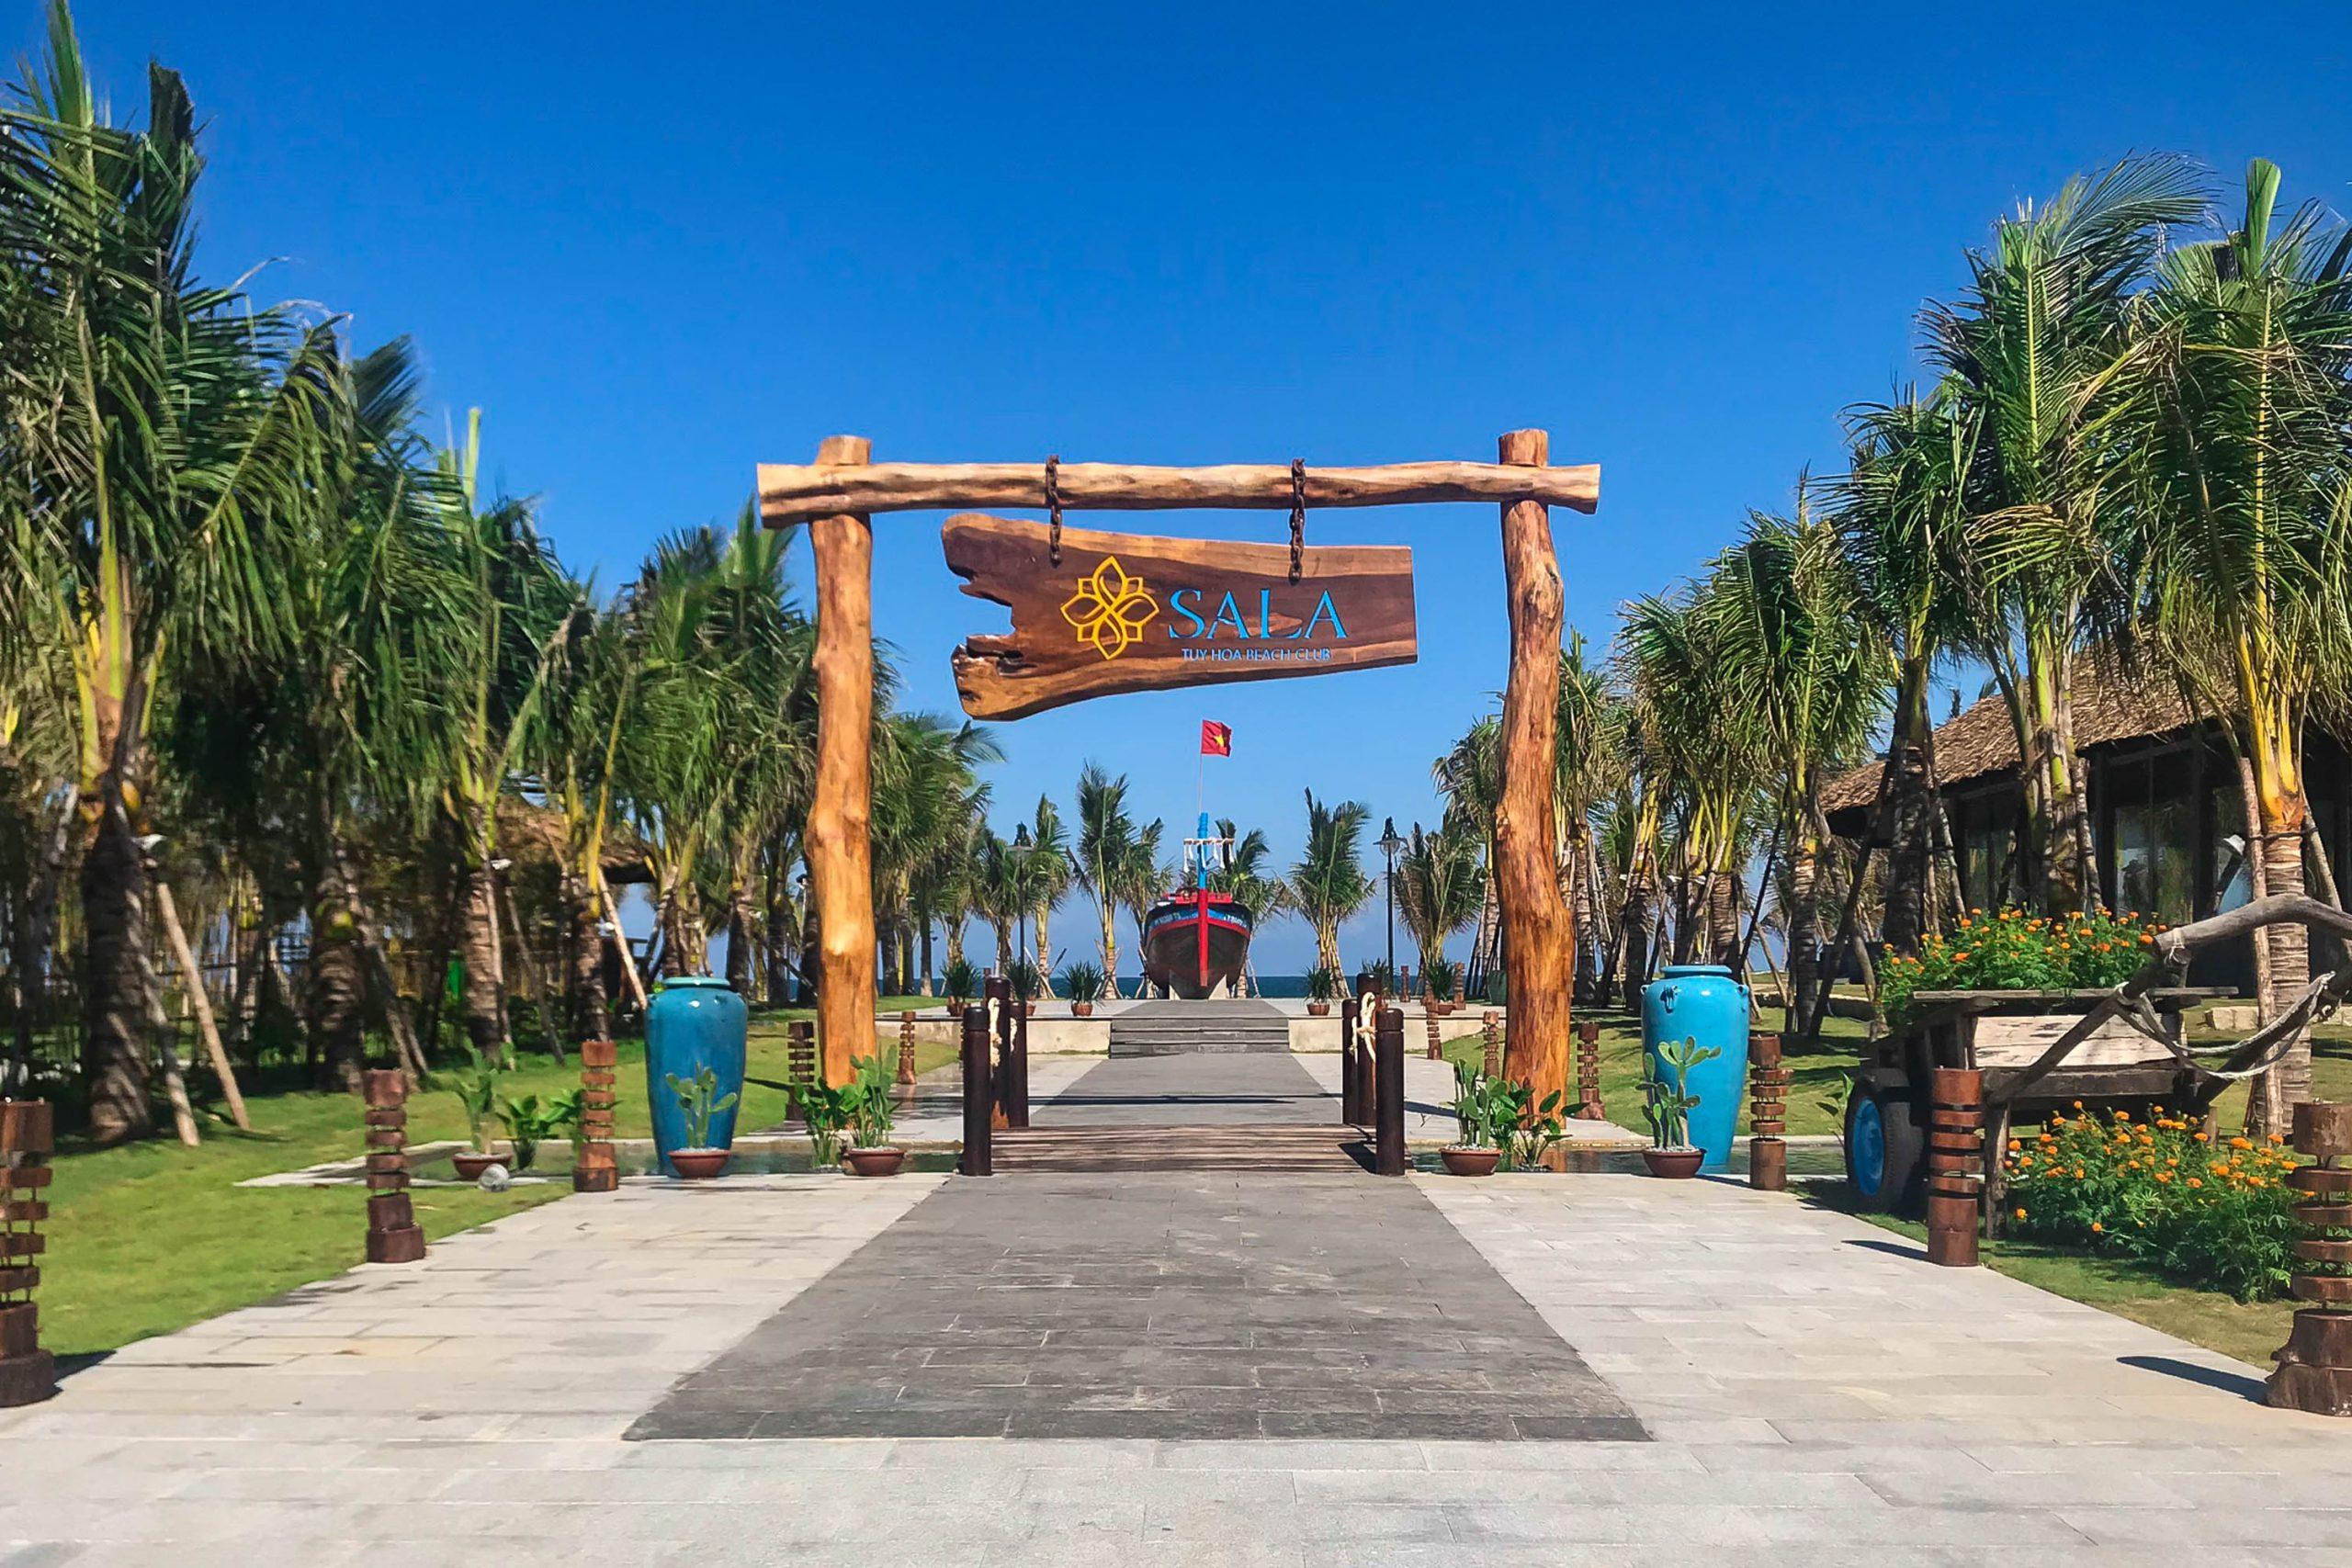 Khách sạn gần biển Tuy Hòa - Sala Tuy Hòa Beach